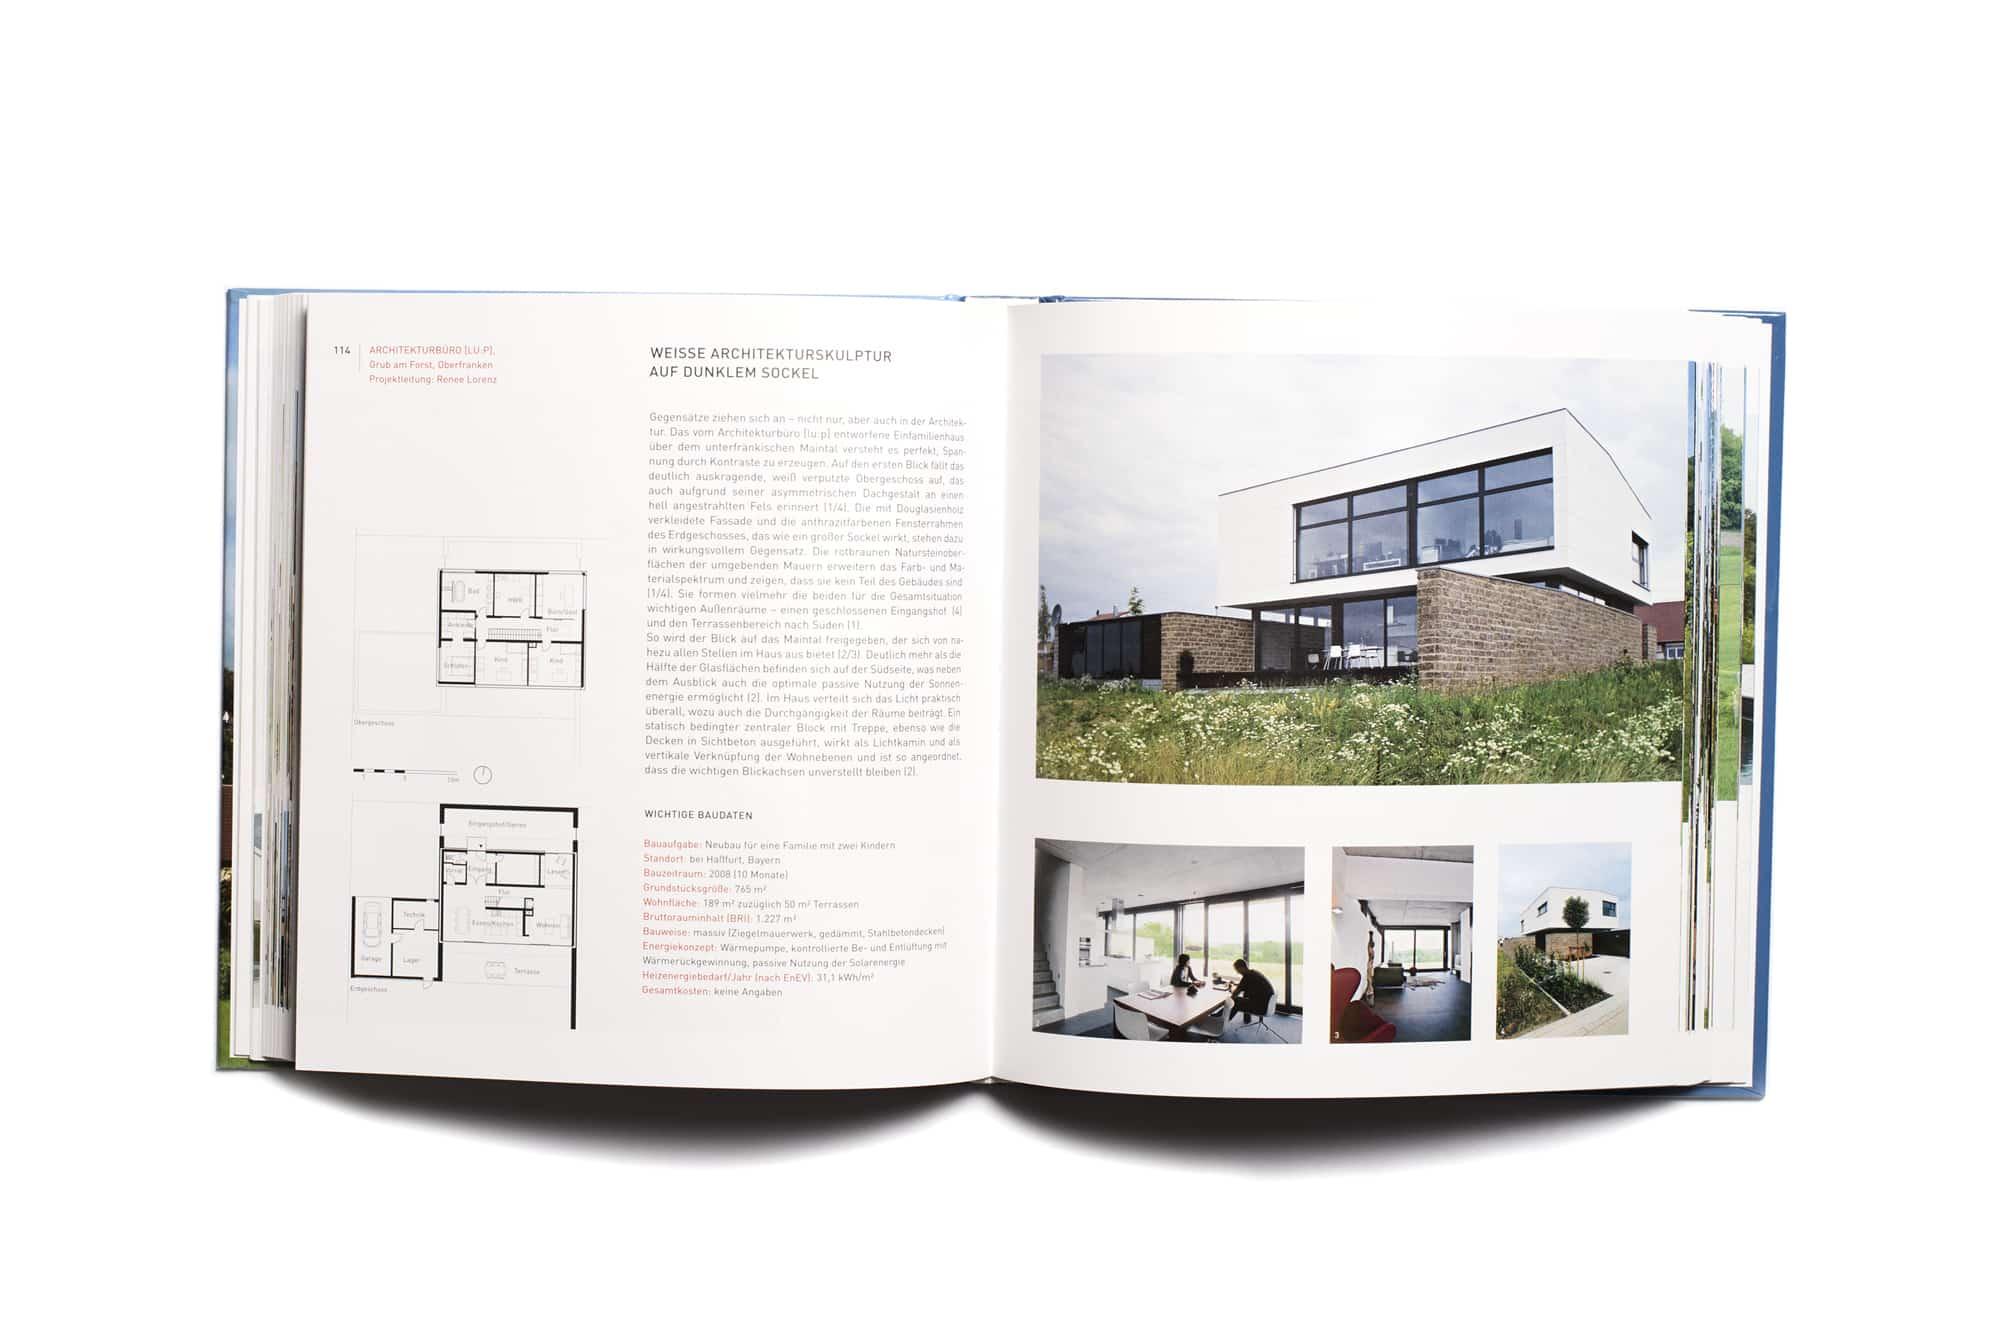 Neue Top 100 Häuser | [lu:p] Architektur GmbH Coburg